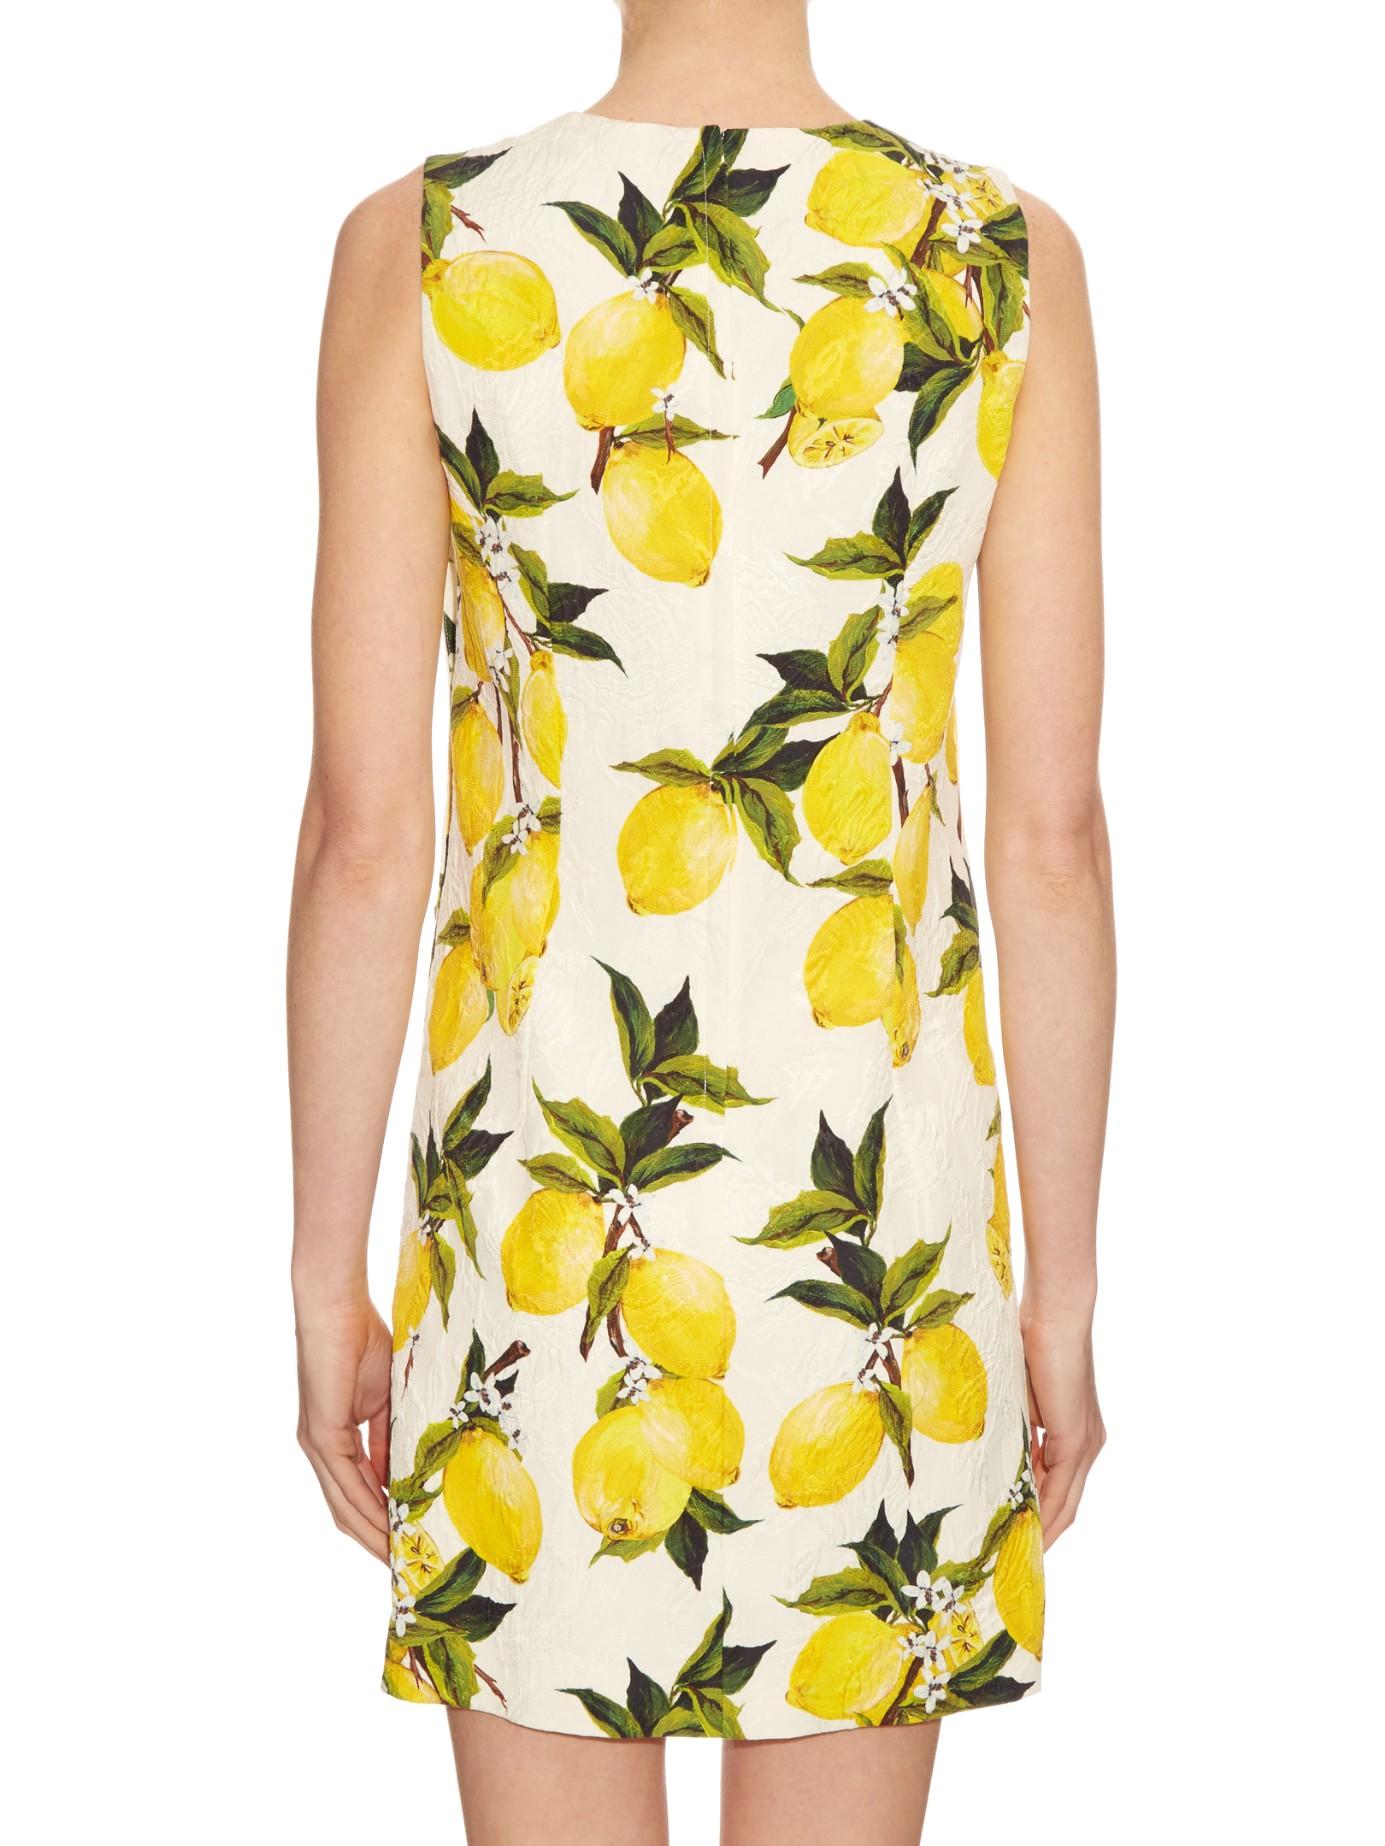 26dc13956a9 Dolce And Gabbana Lemon Dress Price